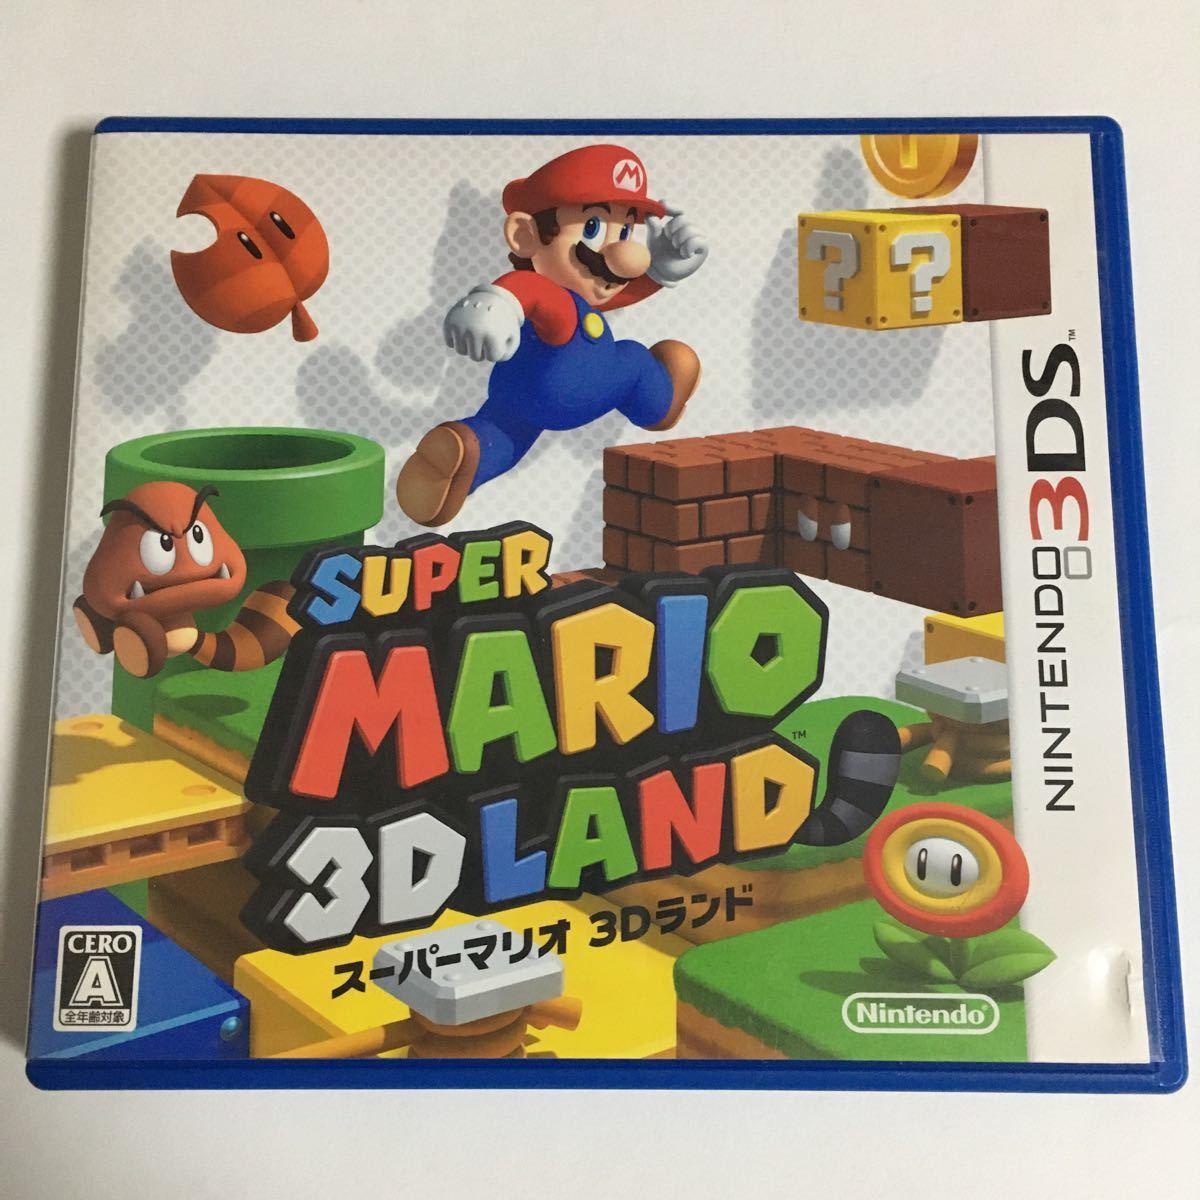 Nintendo 3DS スーパーマリオ3Dランド ソフト 動作確認済み